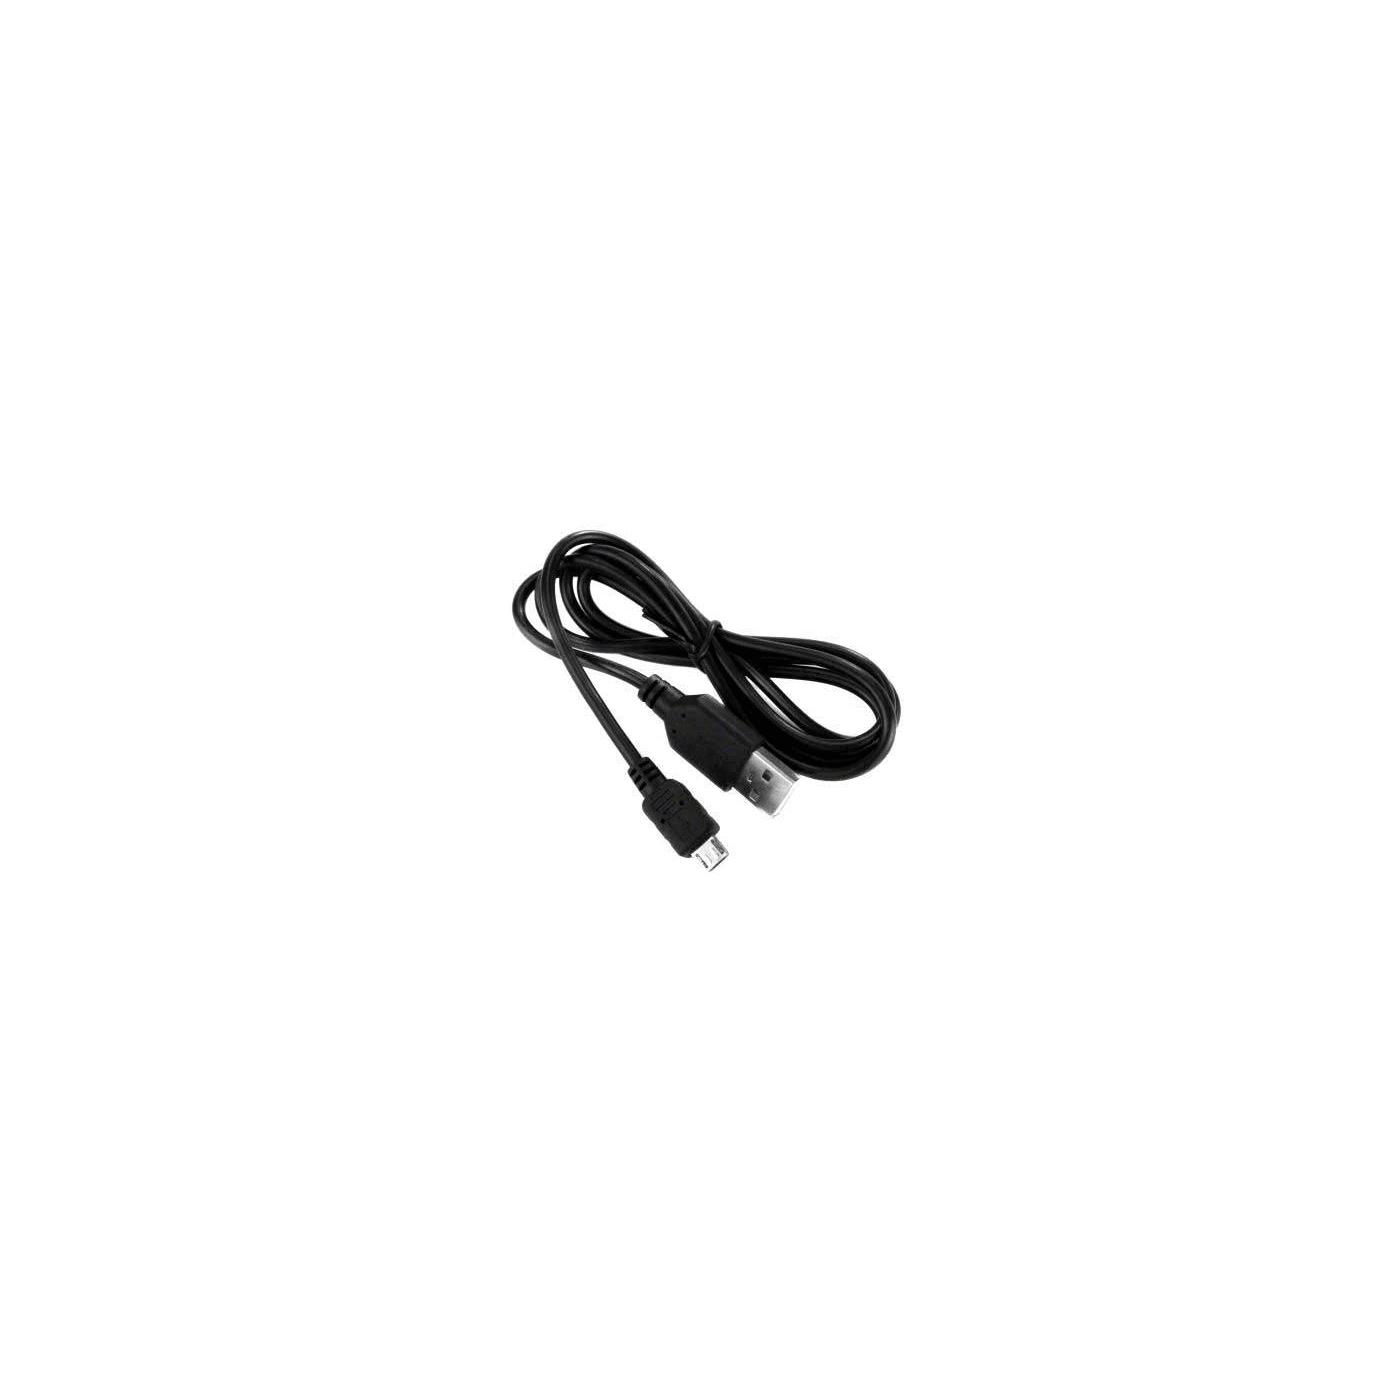 Eleaf iStick Micro USB Cord